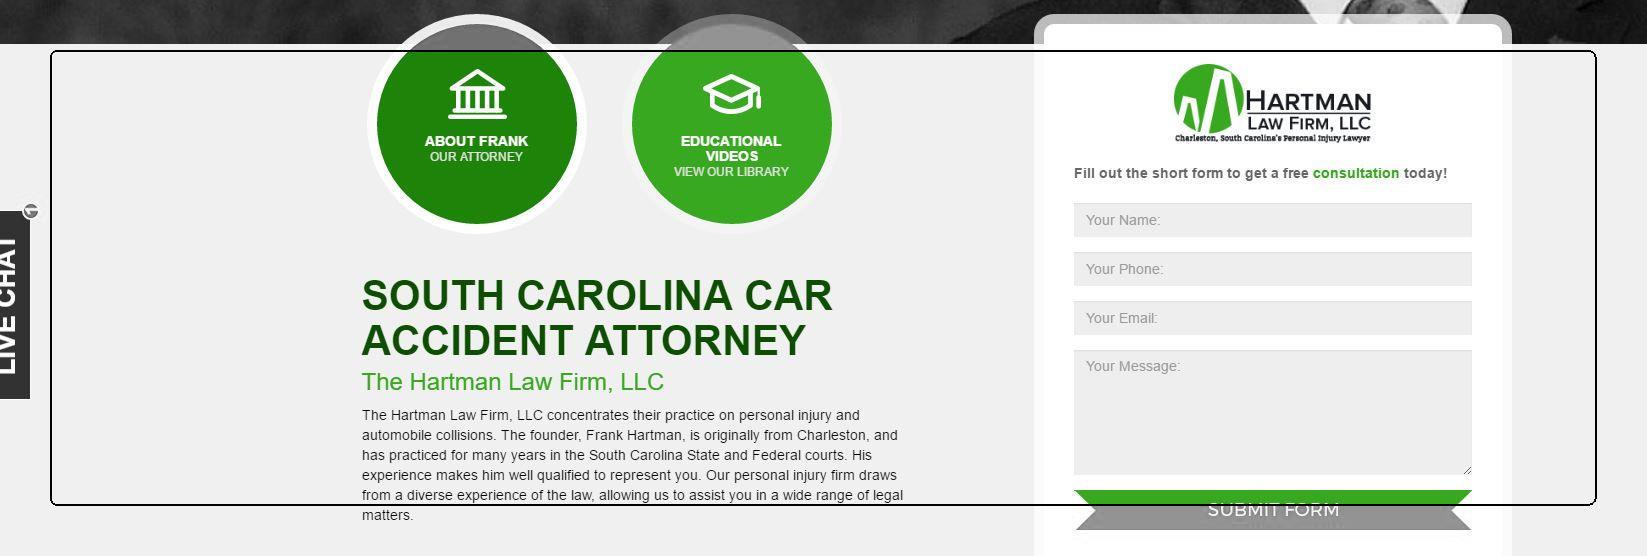 The Hartman Law Firm, LLC image 1